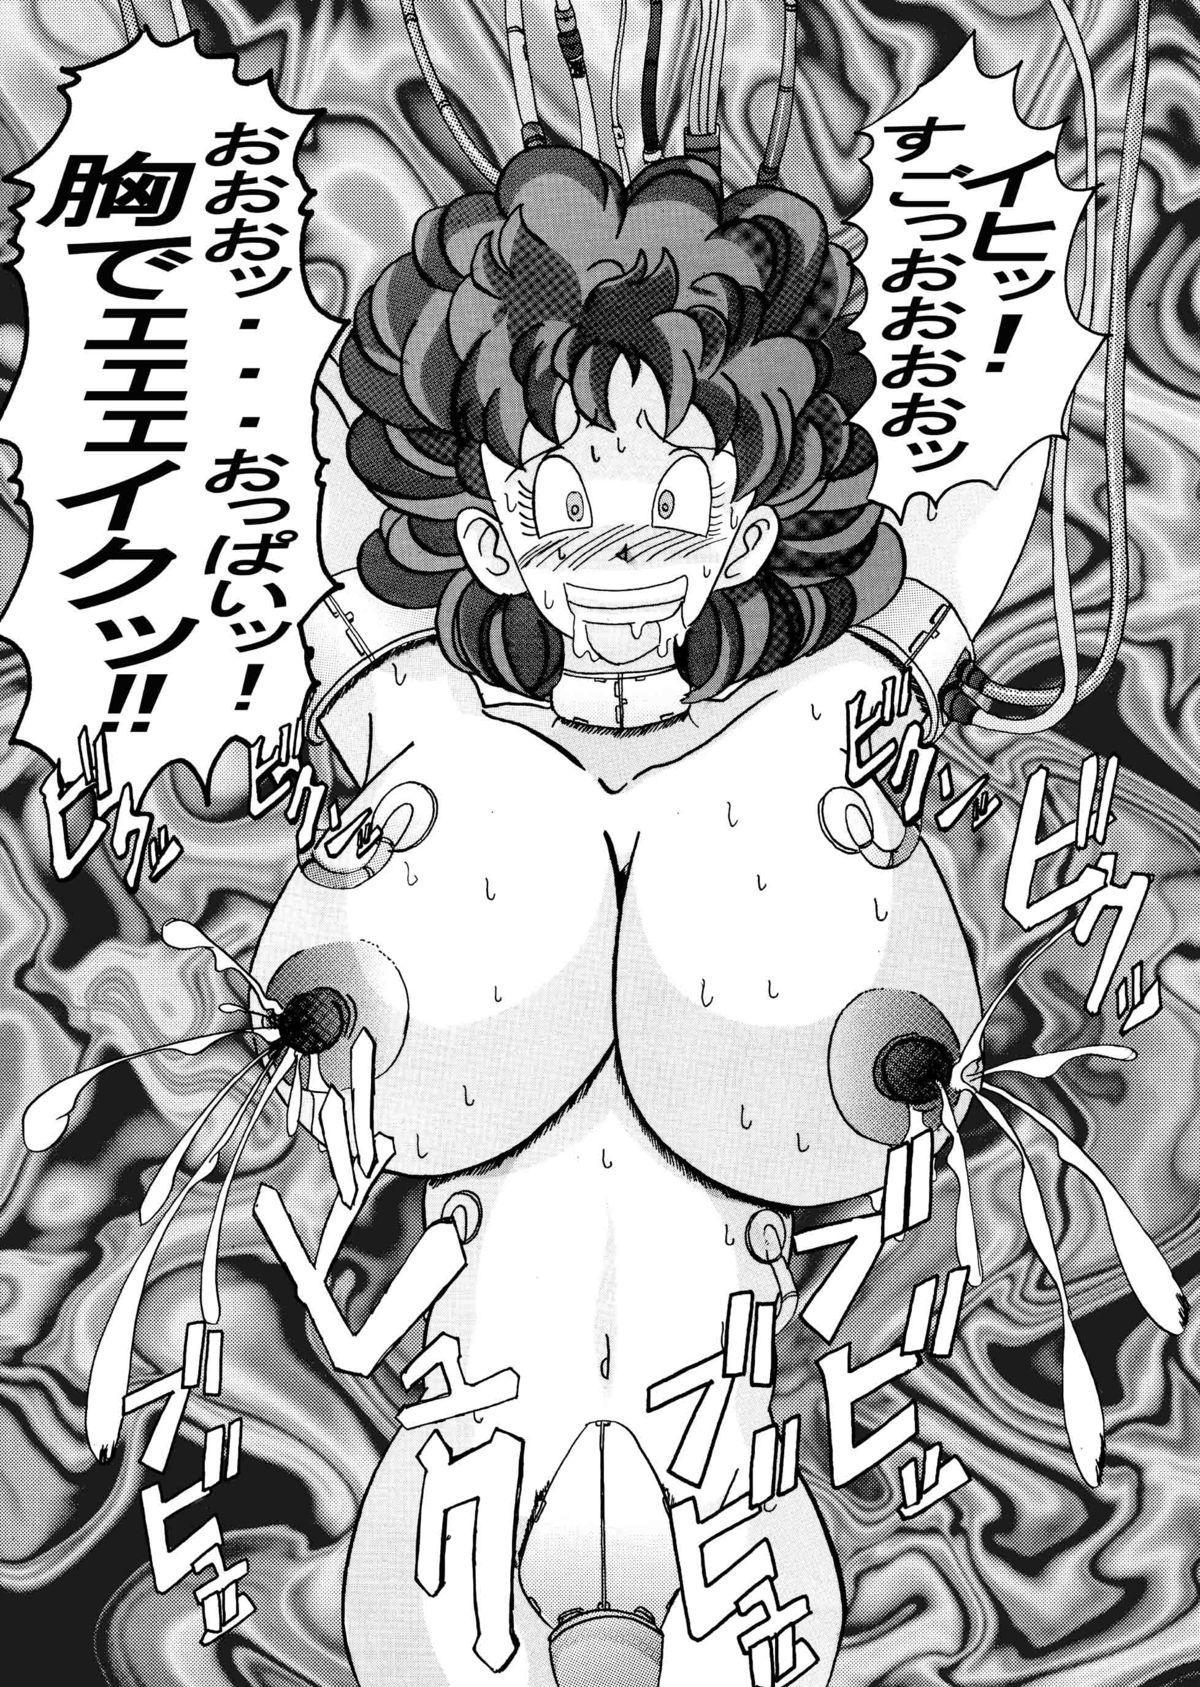 [Light Rate Port Pink] Tanjou!! Aku no Onna Senshi Jinzou Ningen 18-gou Sennou Kaizou Keikaku -Joshou- (Dragon Ball Z) 9